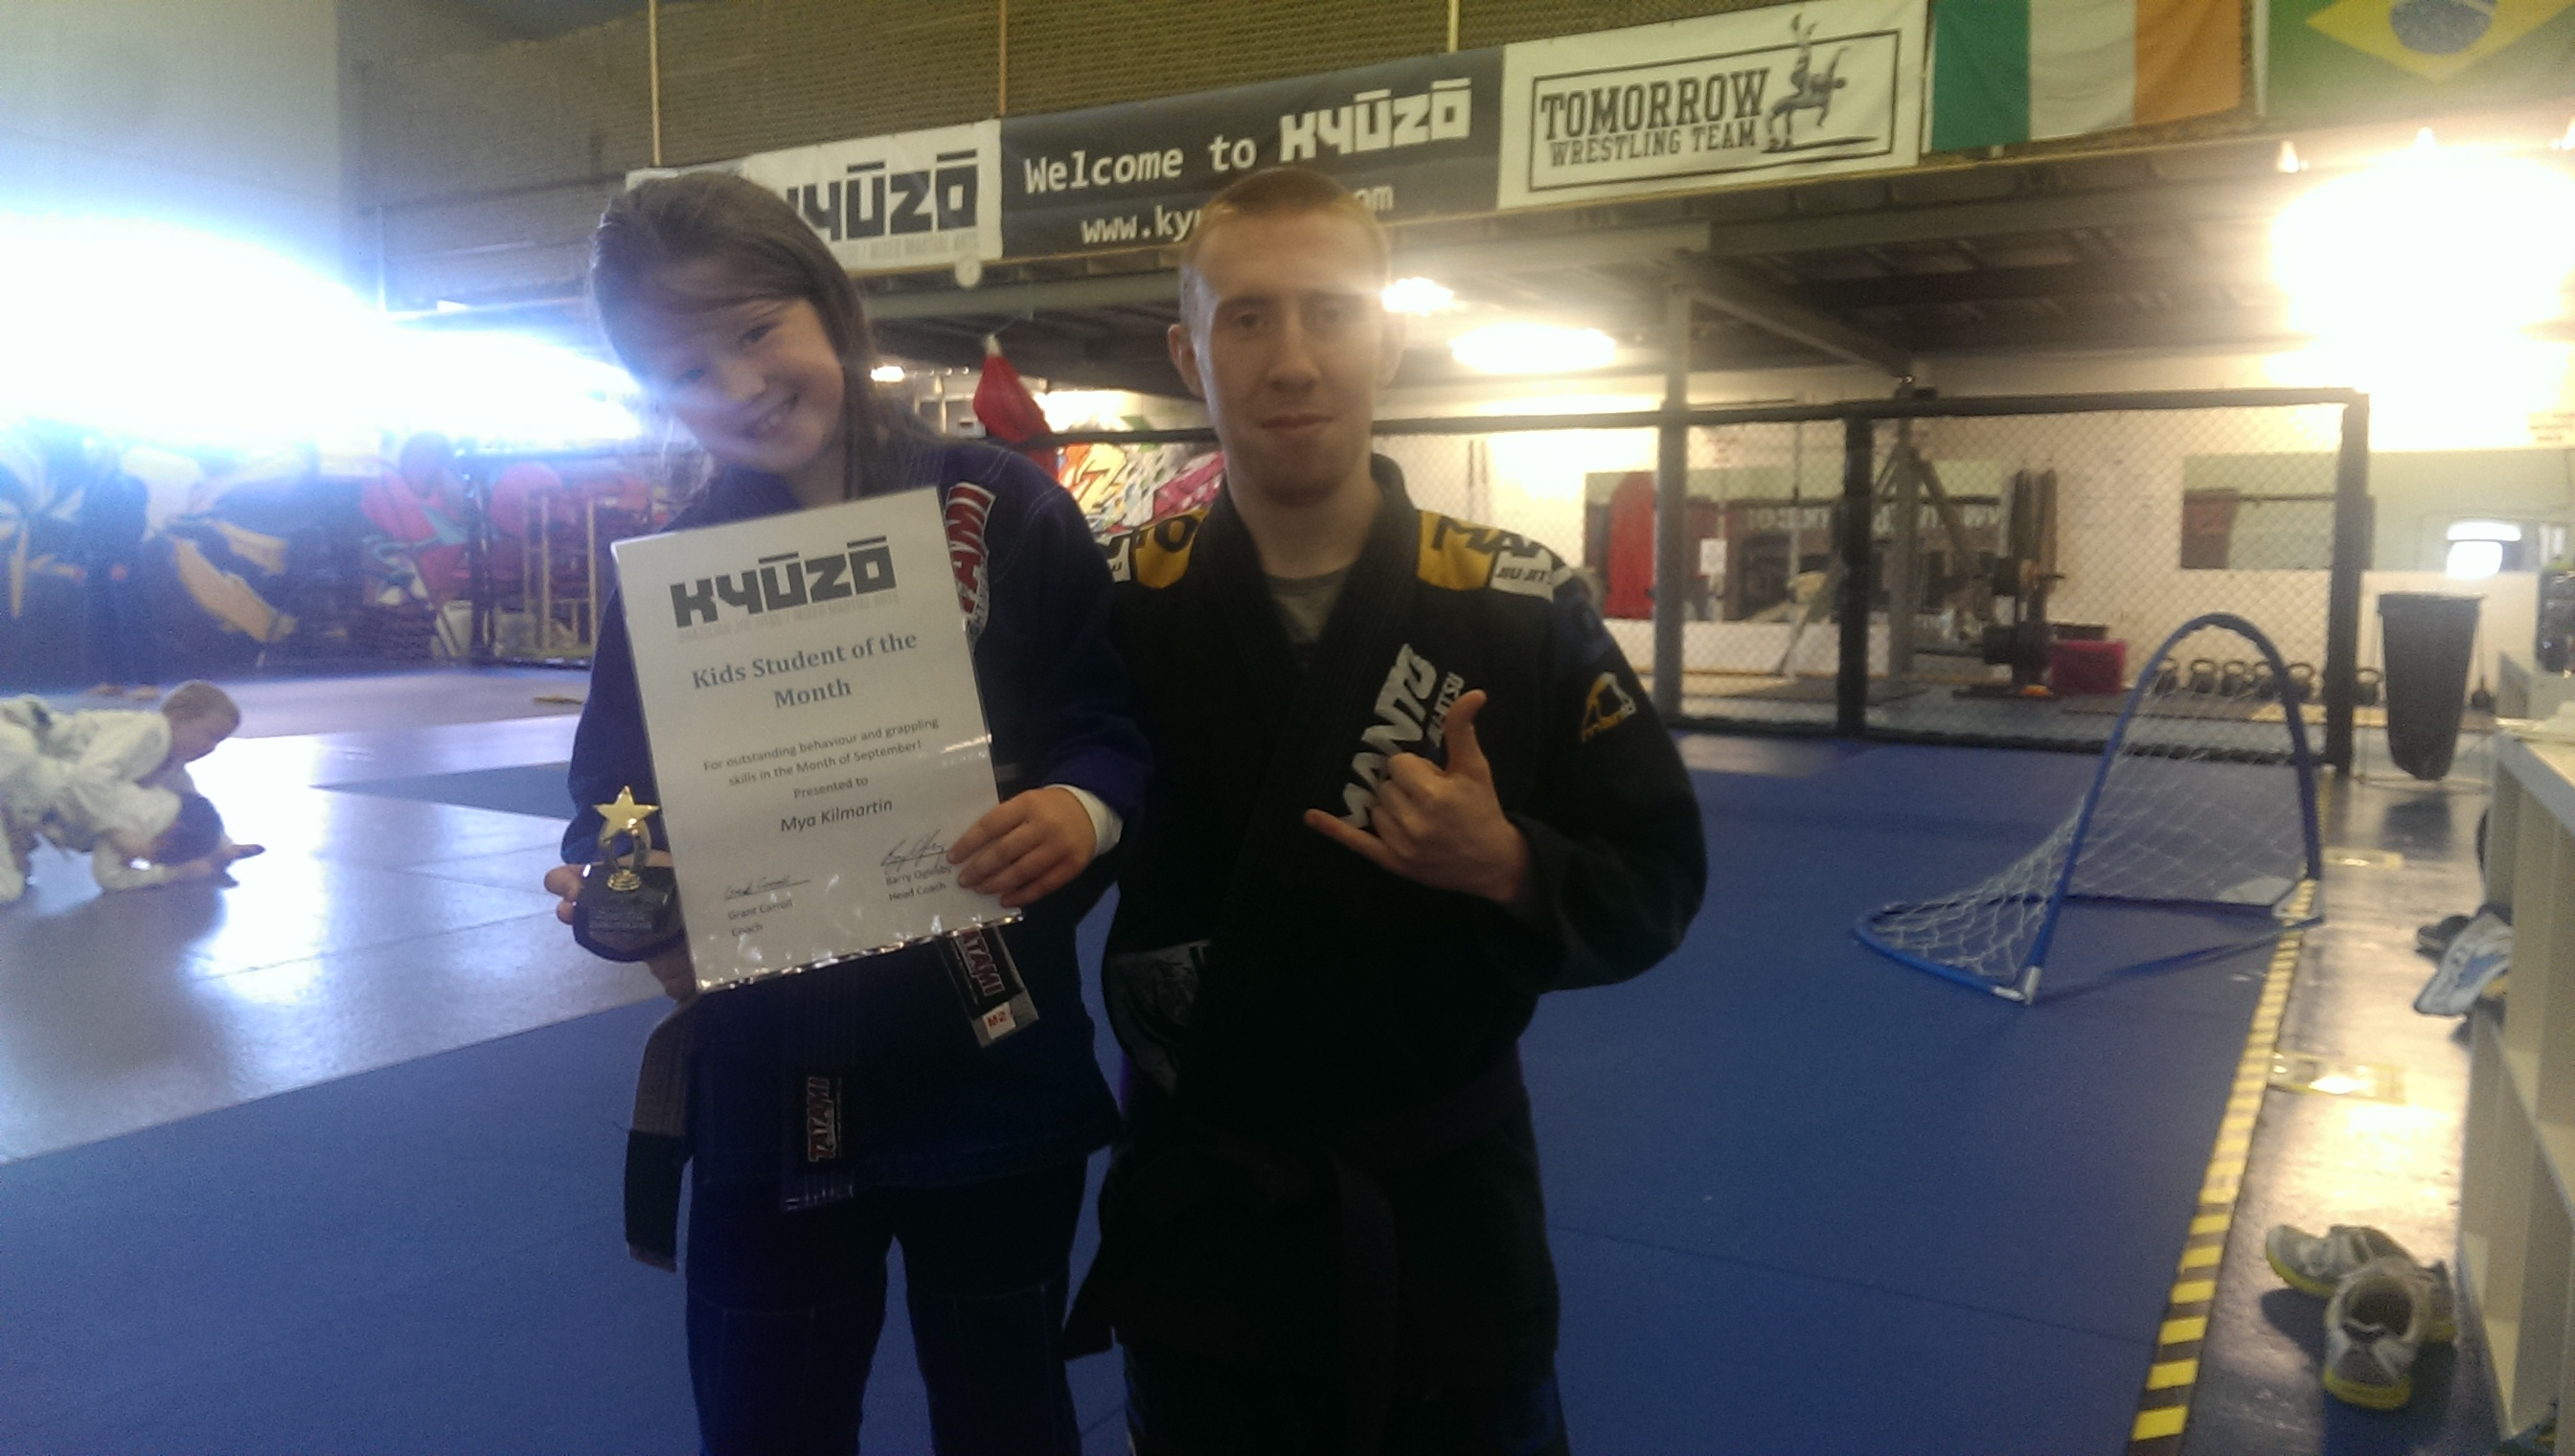 Mya receiving her Brazilian Jiu Jitsu Kids Student of the Month Award for September